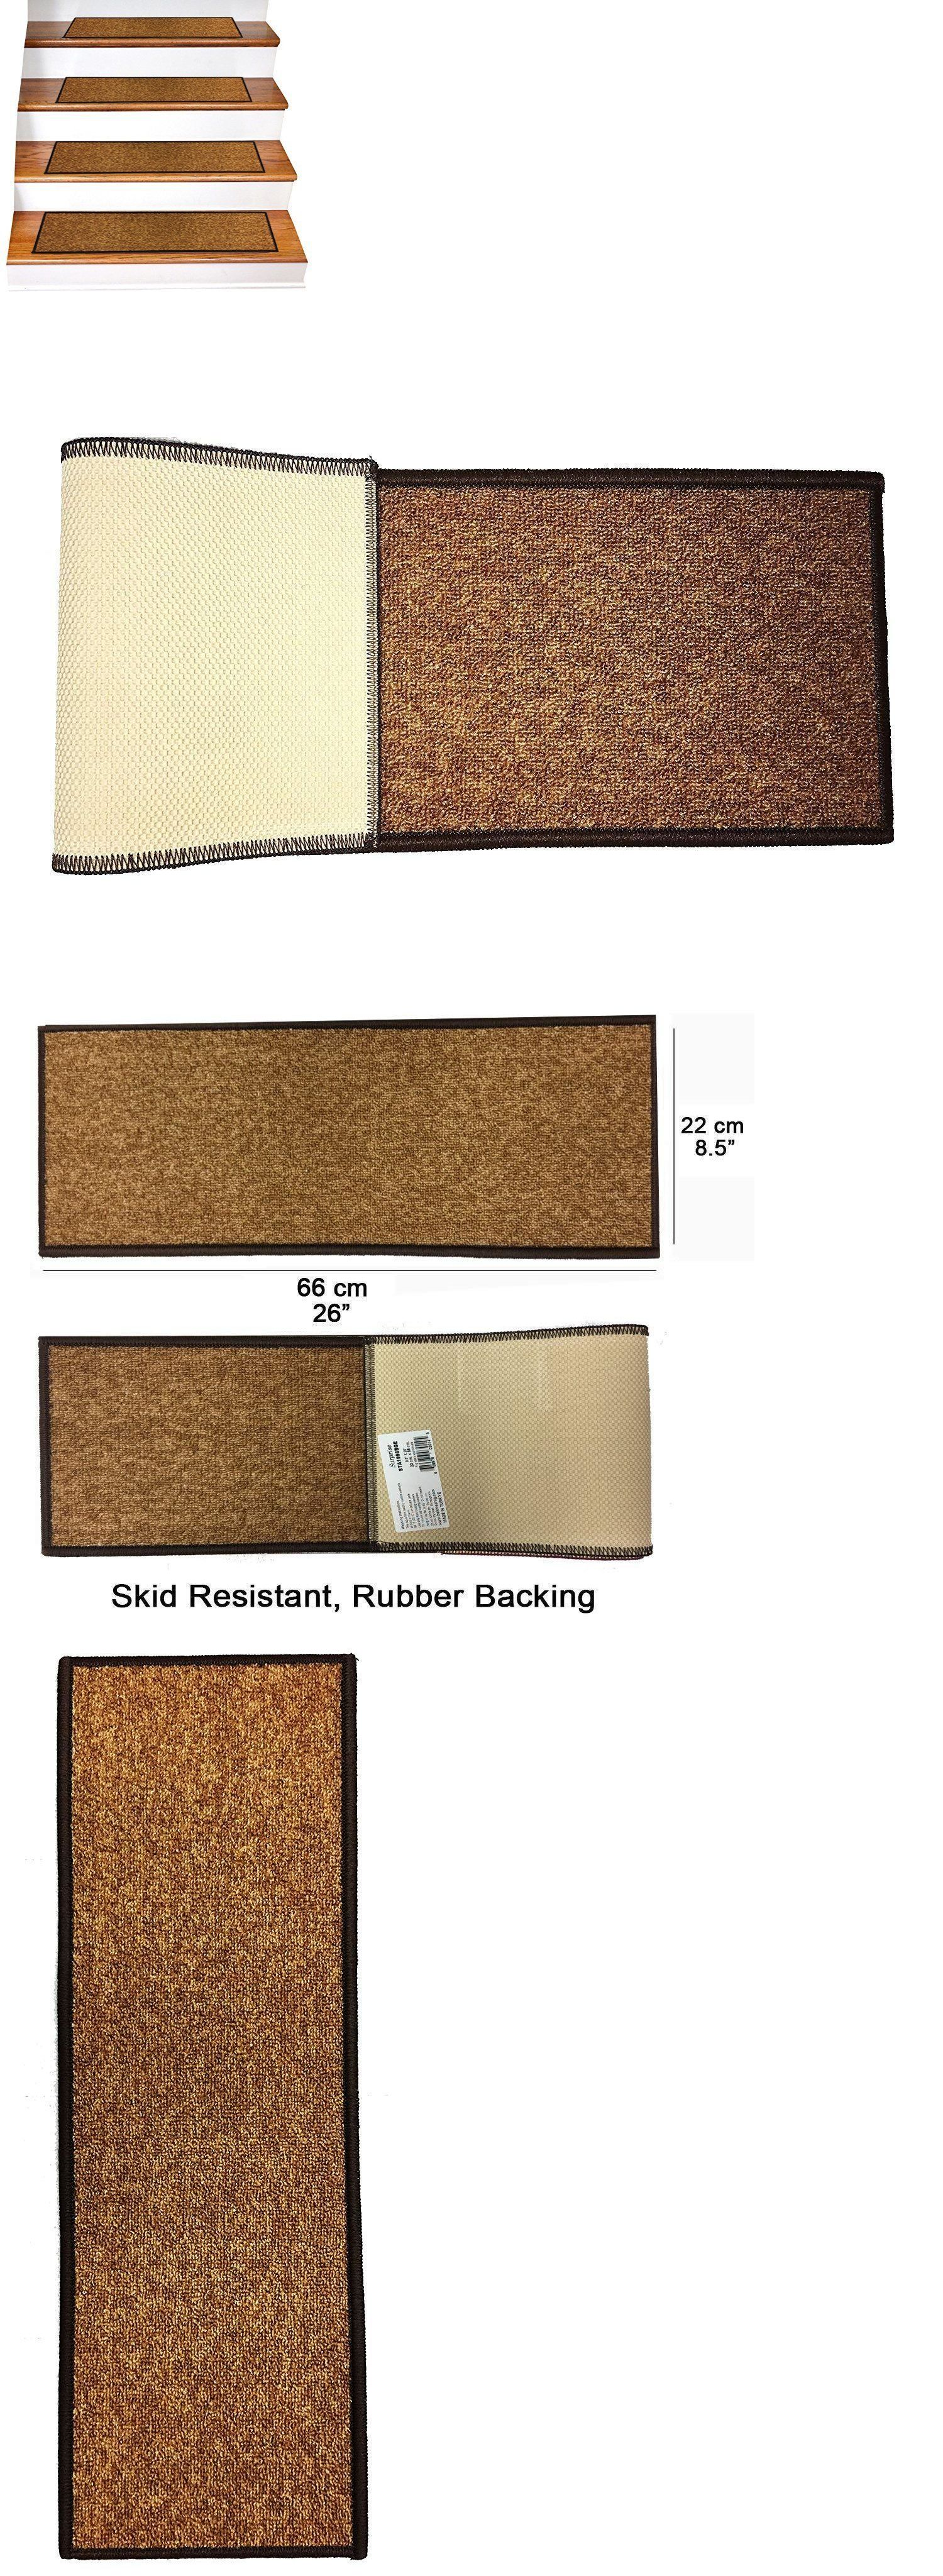 Best Stair Treads 175517 14 Pcs Non Slip Quality Carpet 400 x 300